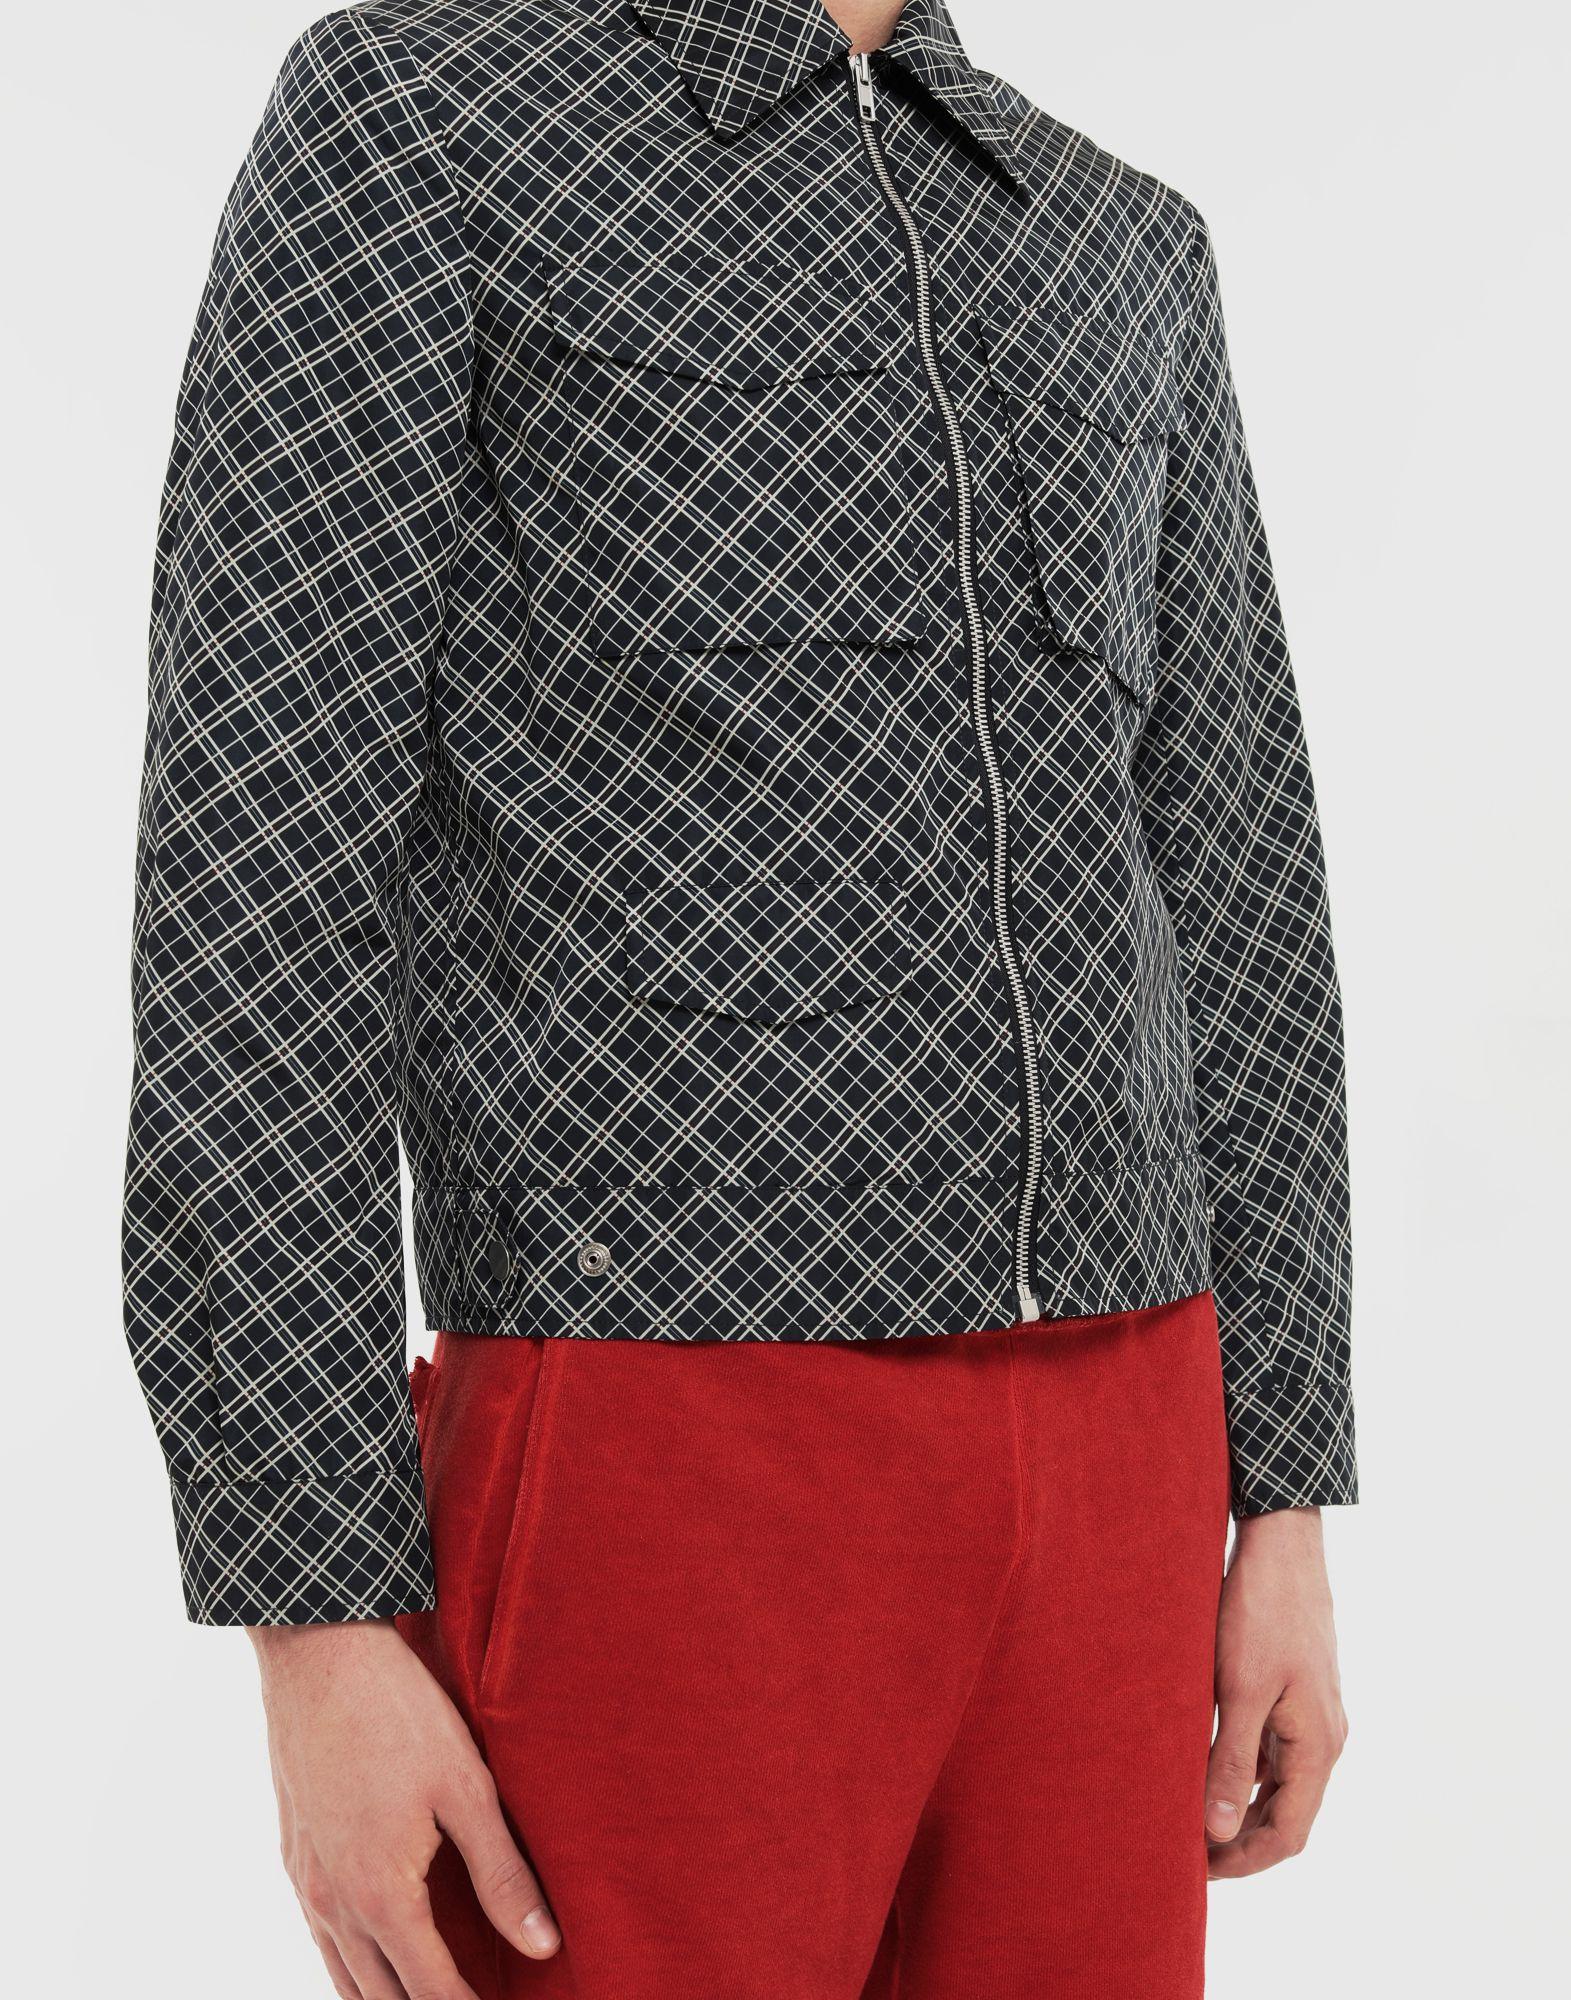 MAISON MARGIELA Checked sports jacket Coats and Trenches Man a